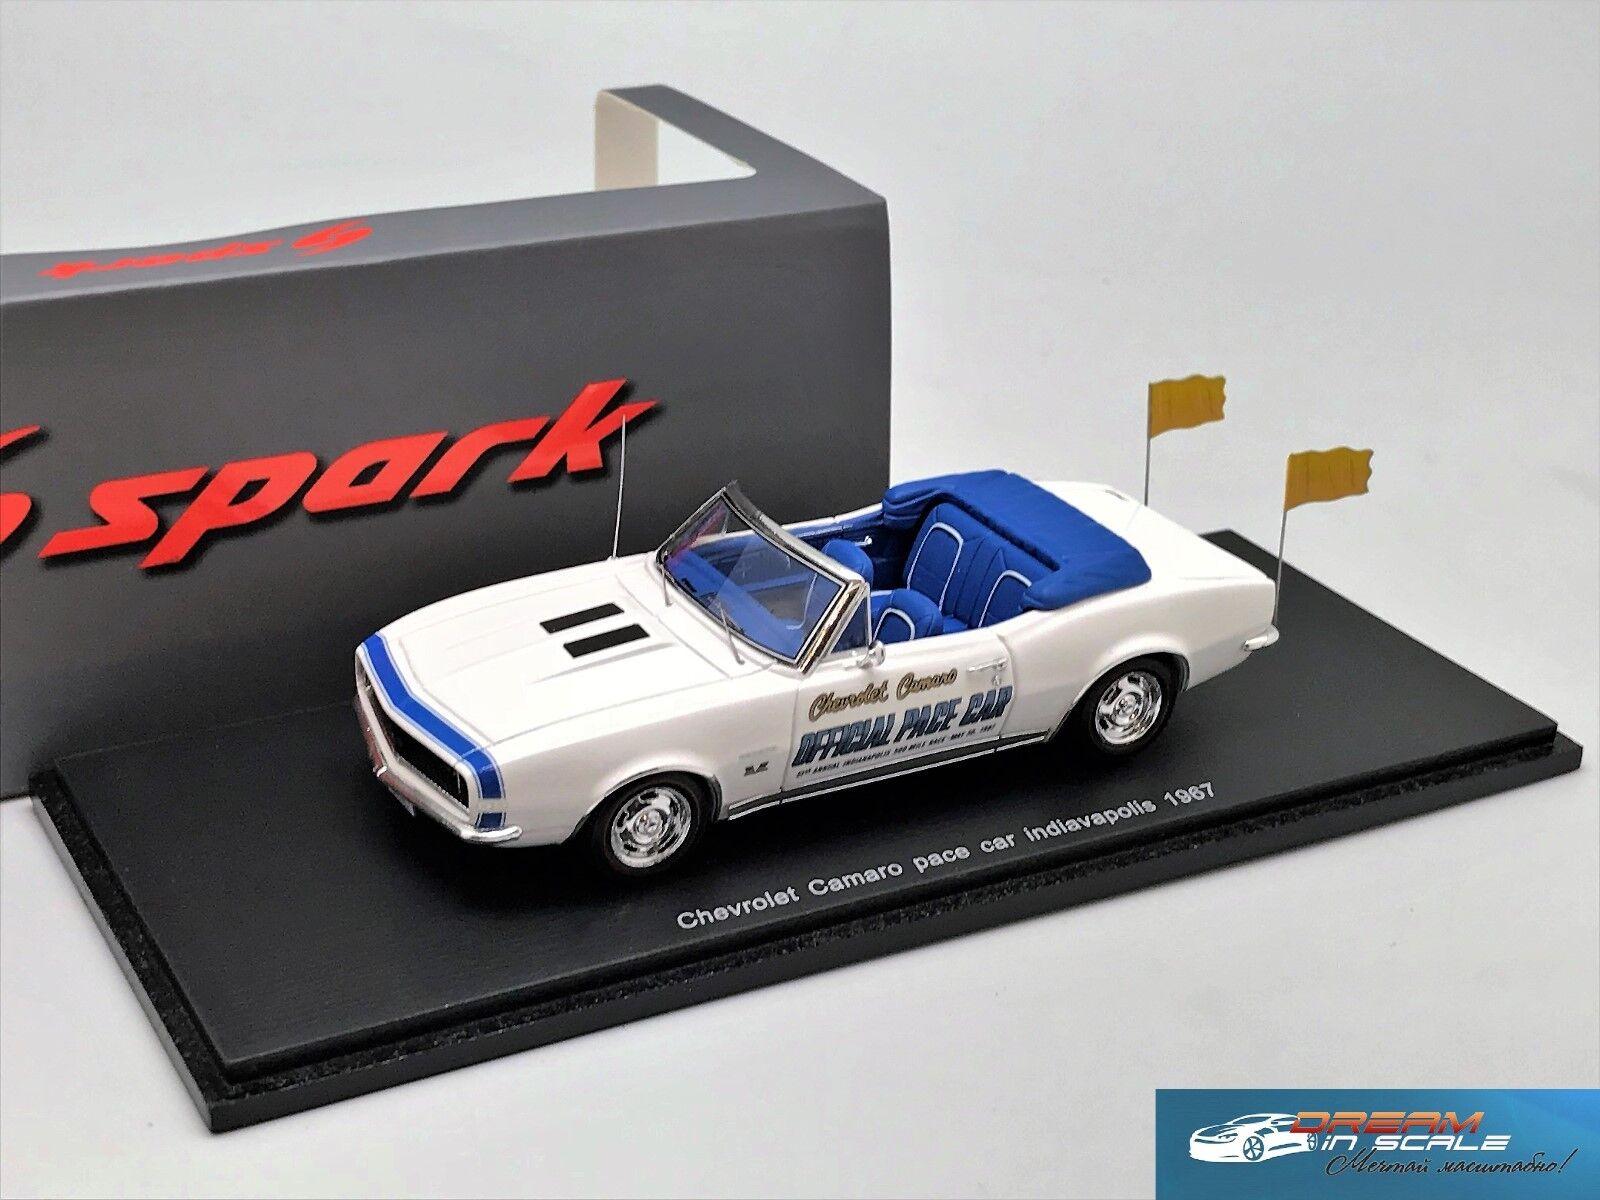 Chevrolet Camaro Pace Car Indianapolis 500 1967 SPARK S2613 1 43